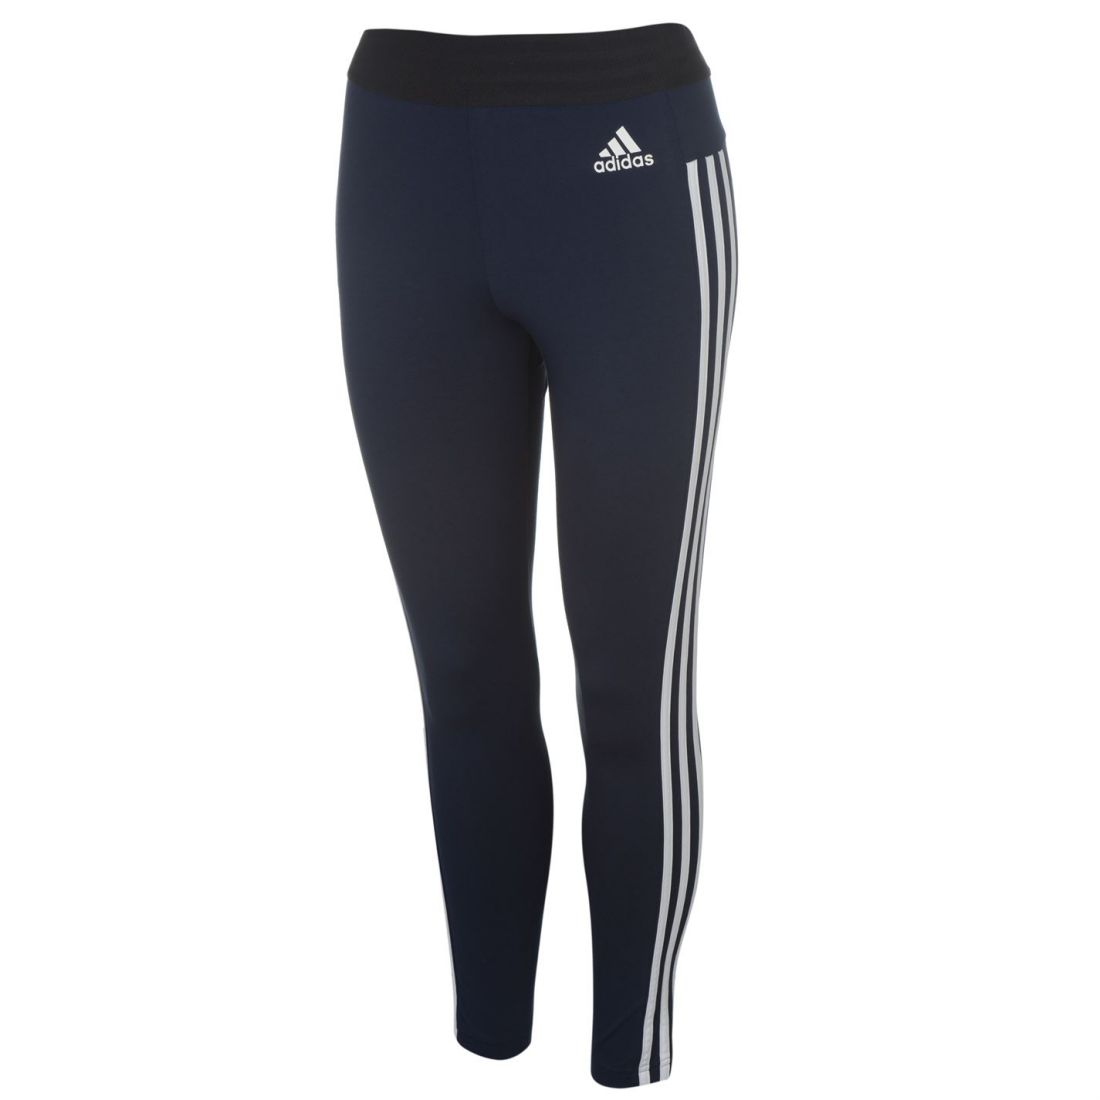 1f699c9d9b2 adidas Womens Ess 3S Tights Sports Elastic Pants Training Bottoms. adidas  Essential 3 Stripe ...